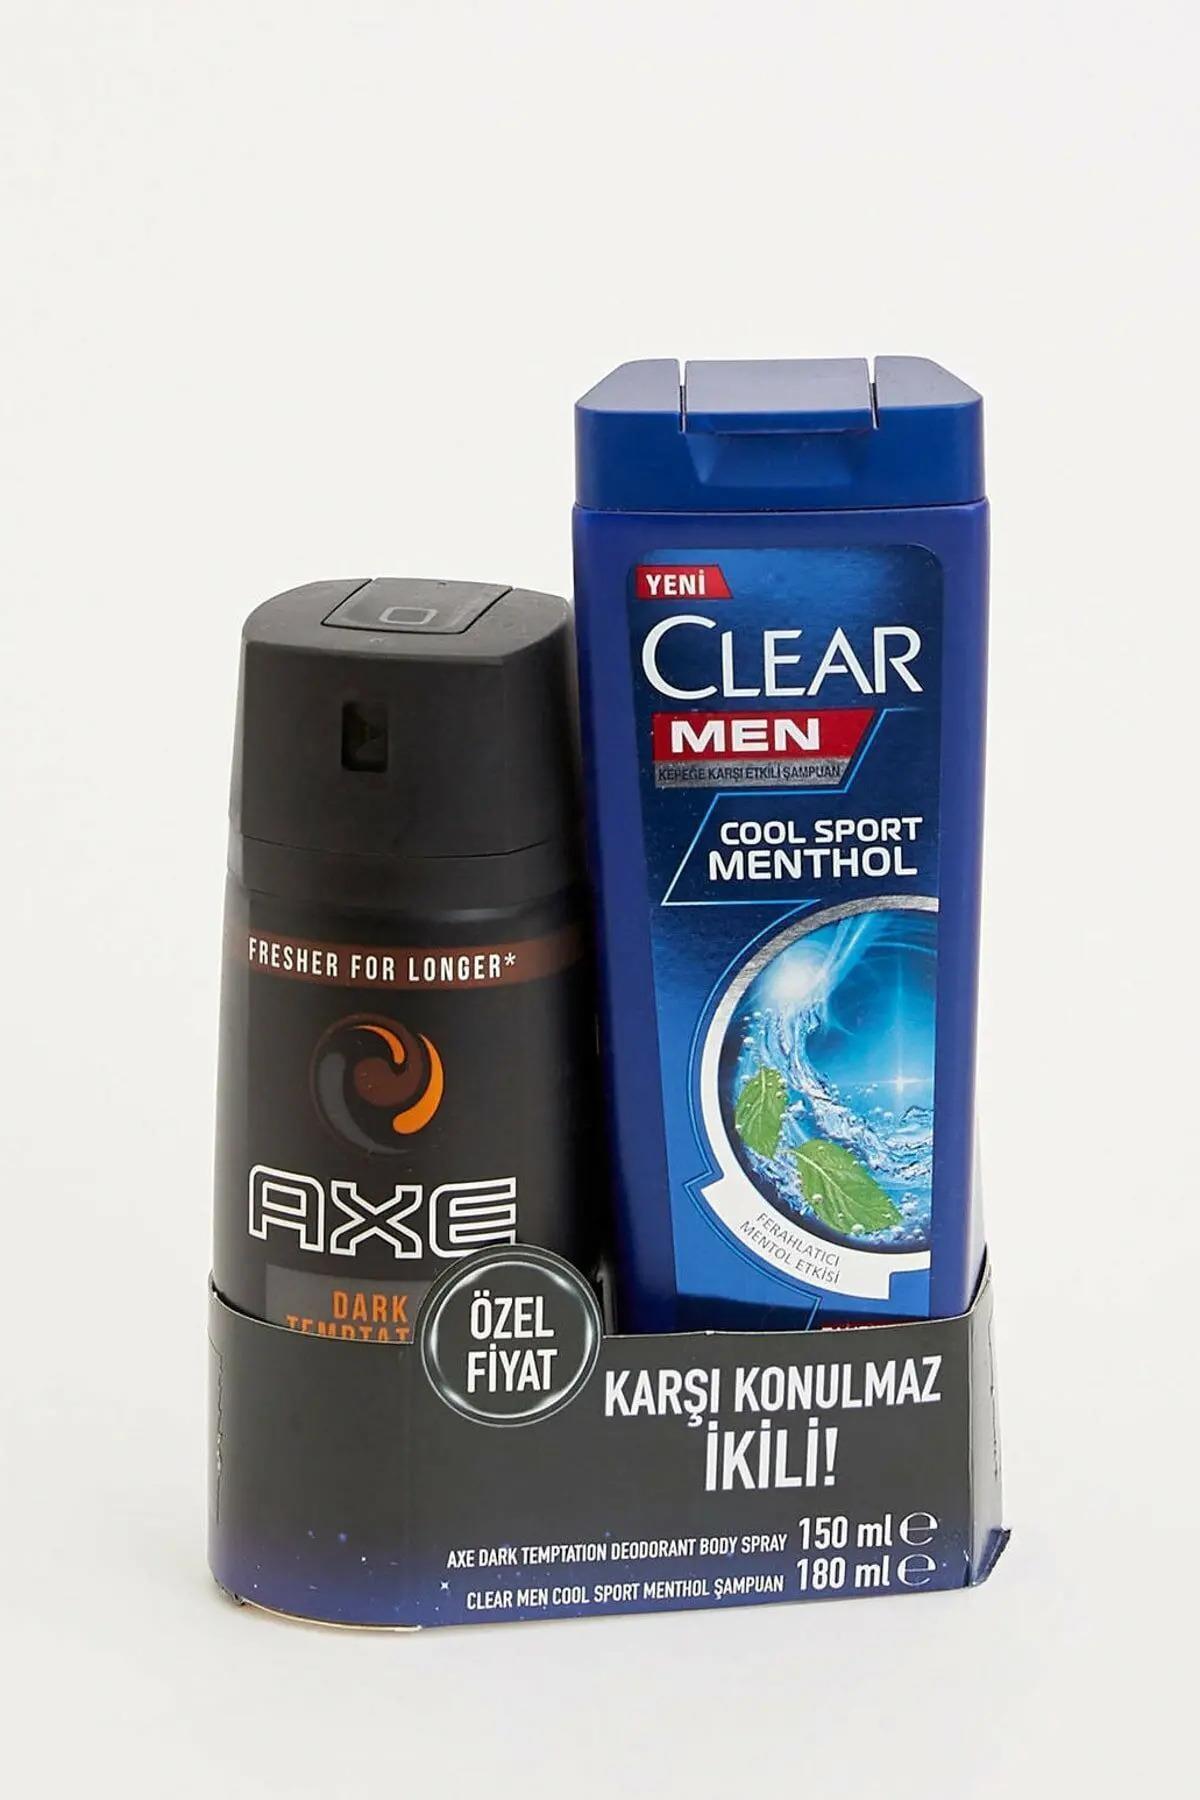 Axe Dark Temptation Deodorant Body Spray + Clear Men Cool Sport Menthol Şampuan 1